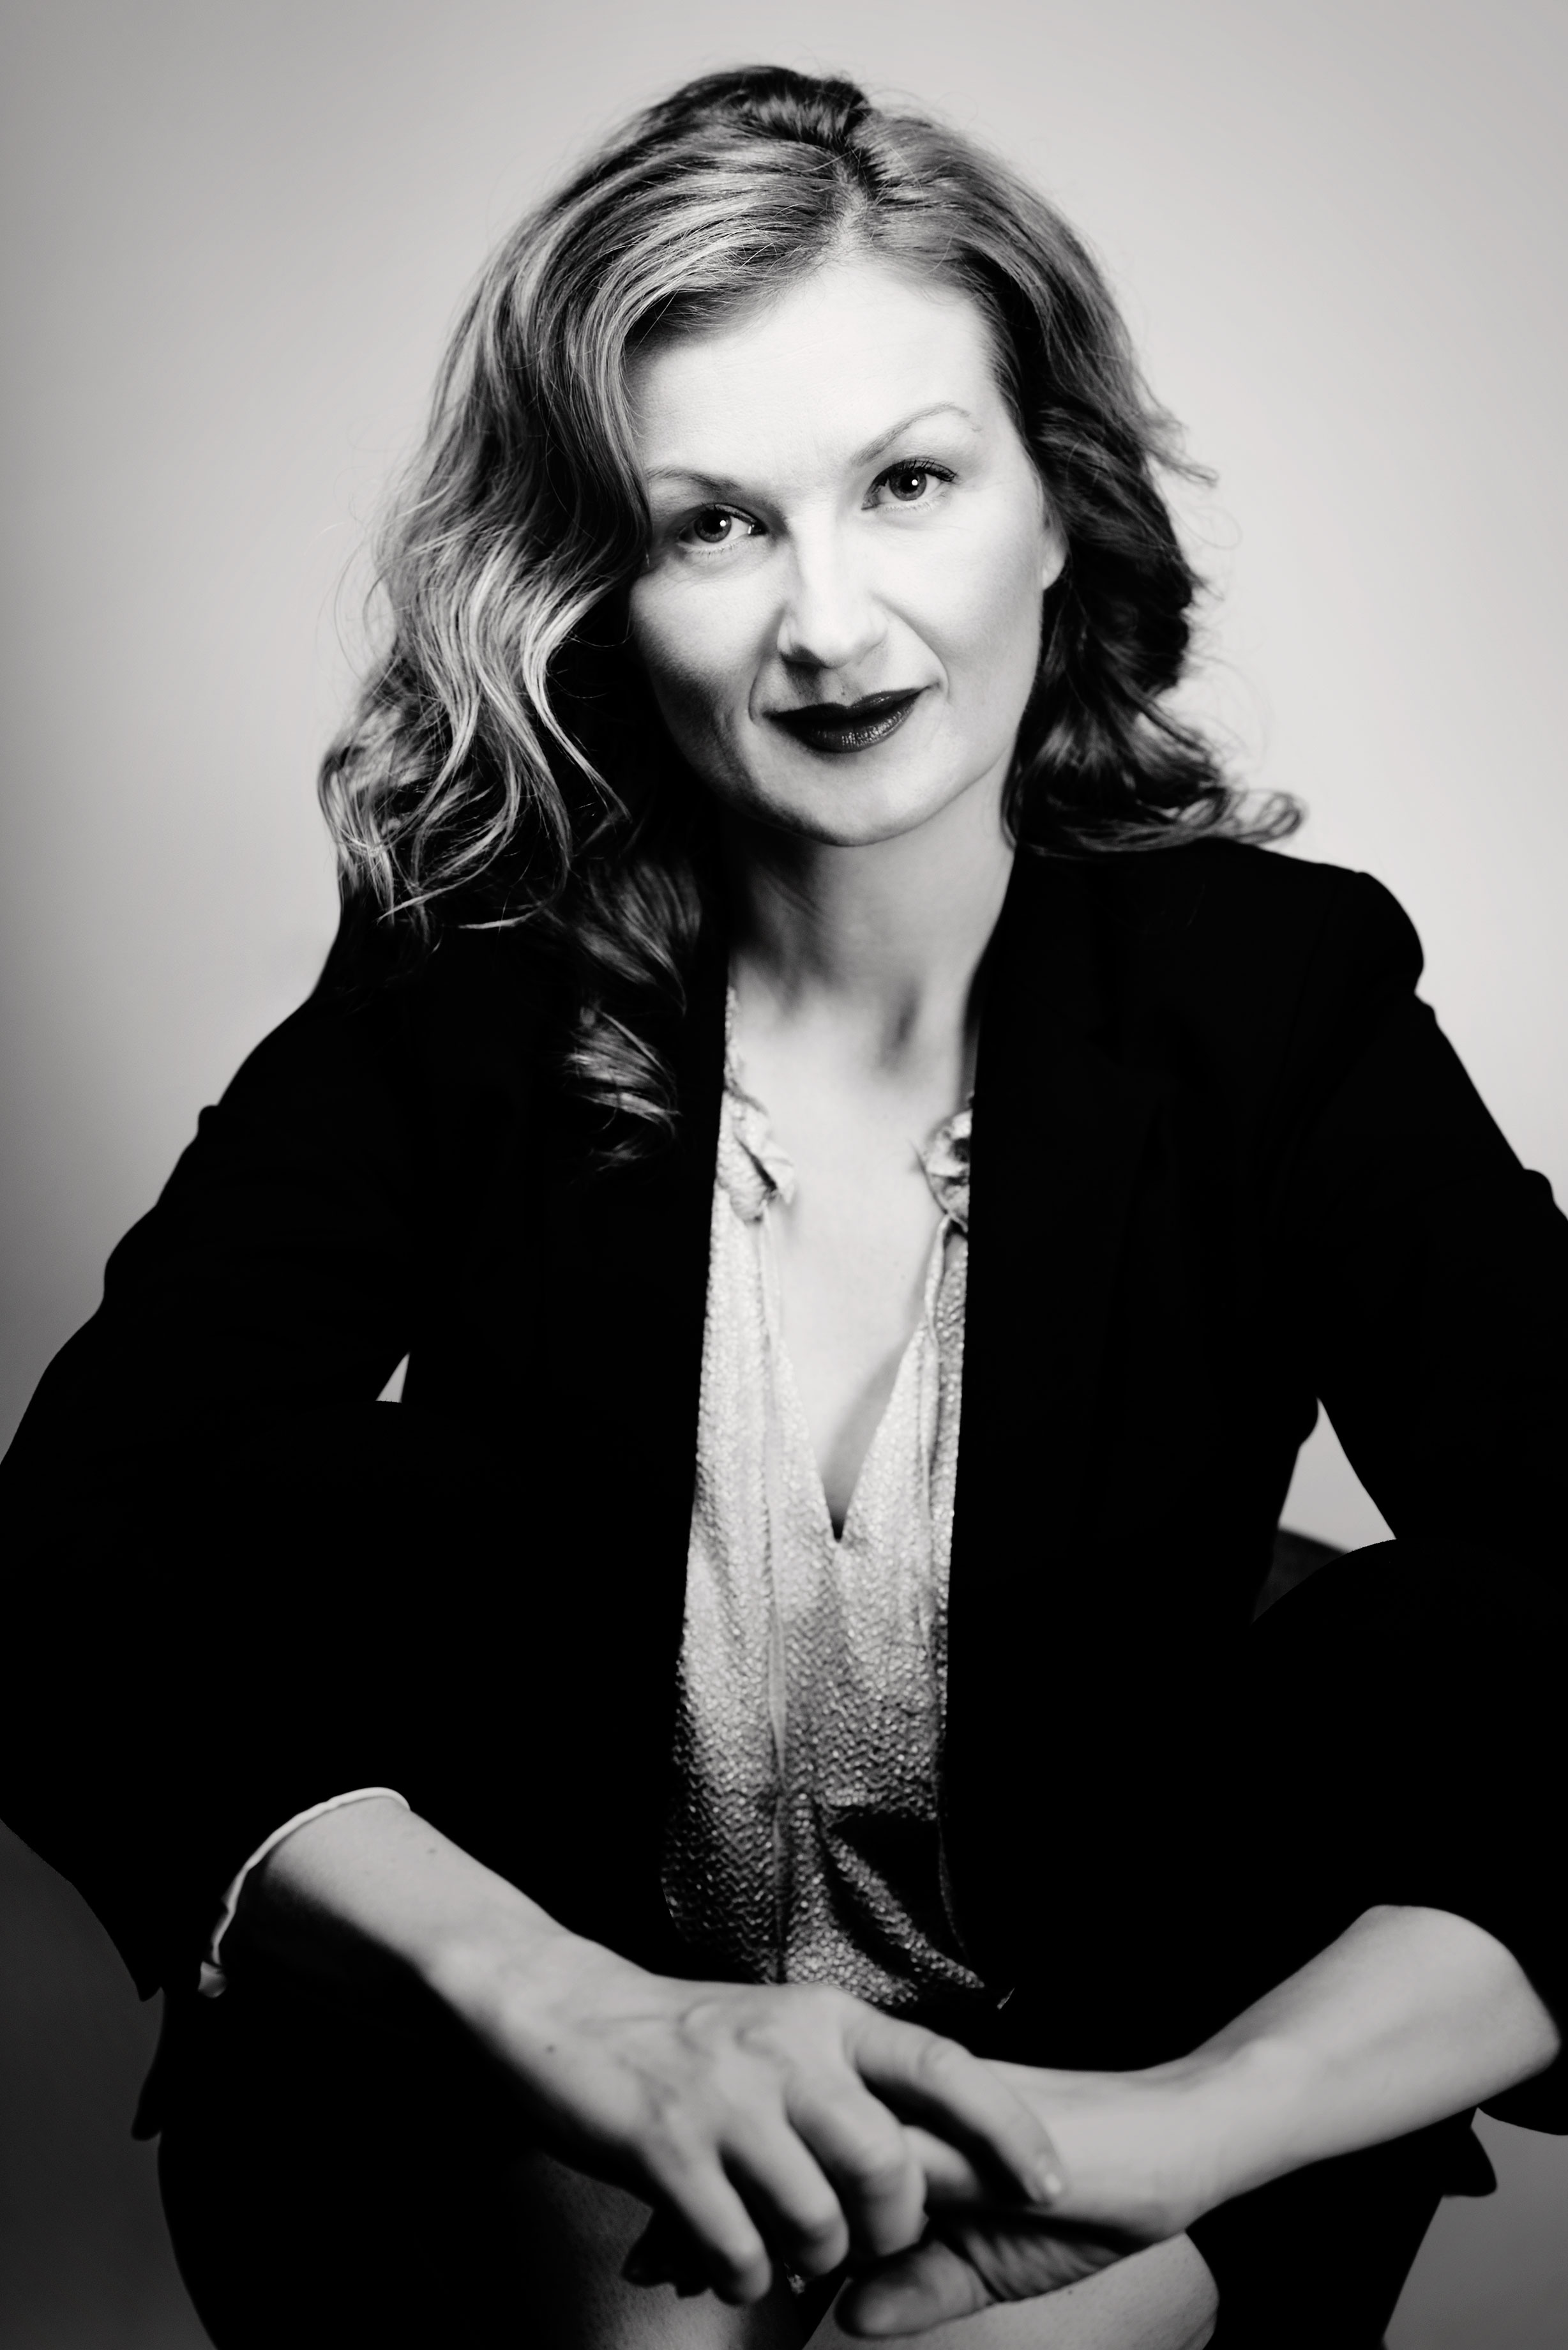 Erika Hebbert